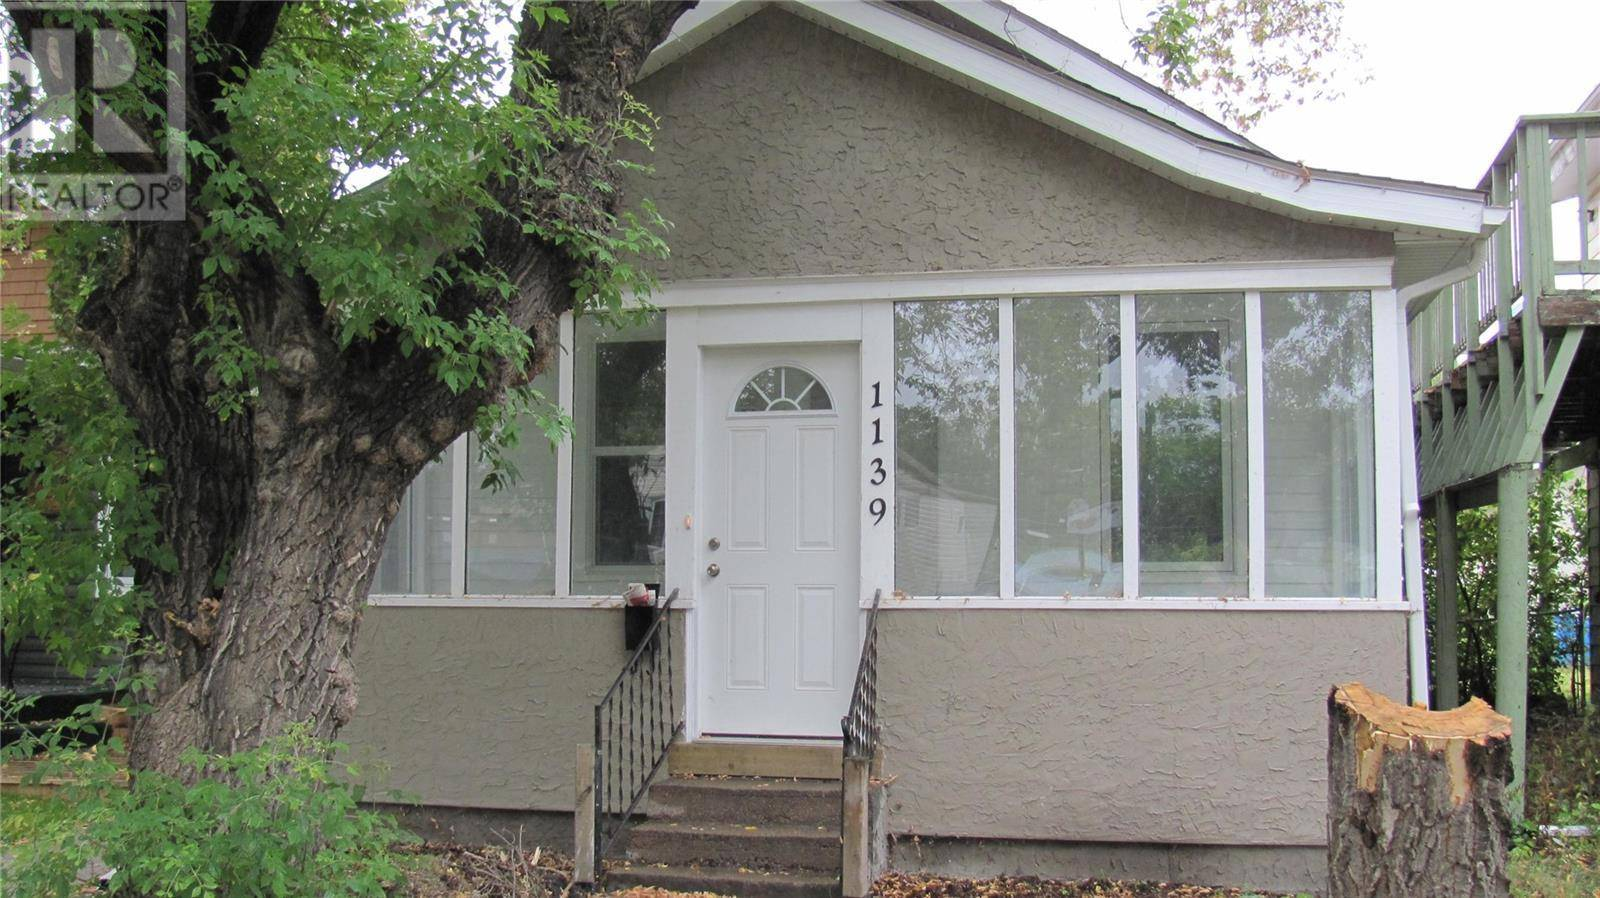 House for sale at 1139 I Ave S Saskatoon Saskatchewan - MLS: SK786214